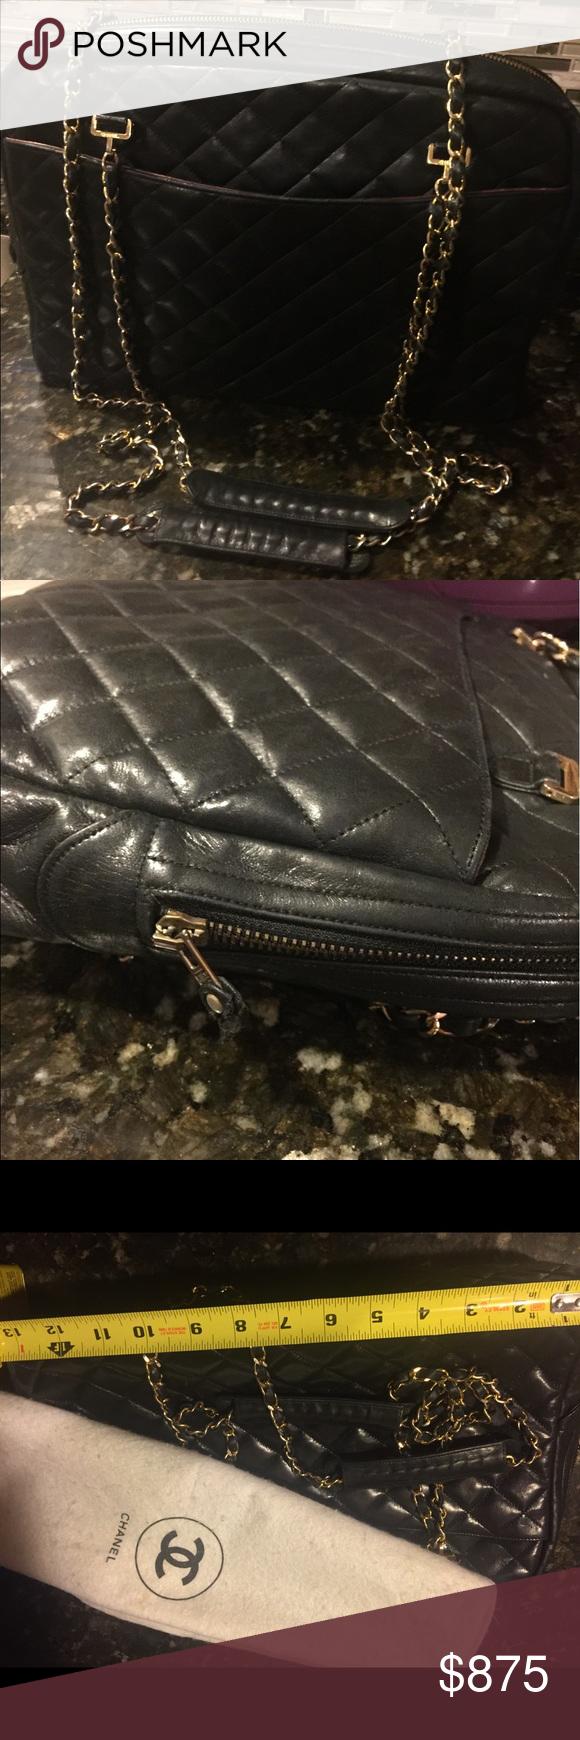 Authentic Chanel Vintage Shopper Handbag Chanel Handbags Leather Handbags Vintage Chanel